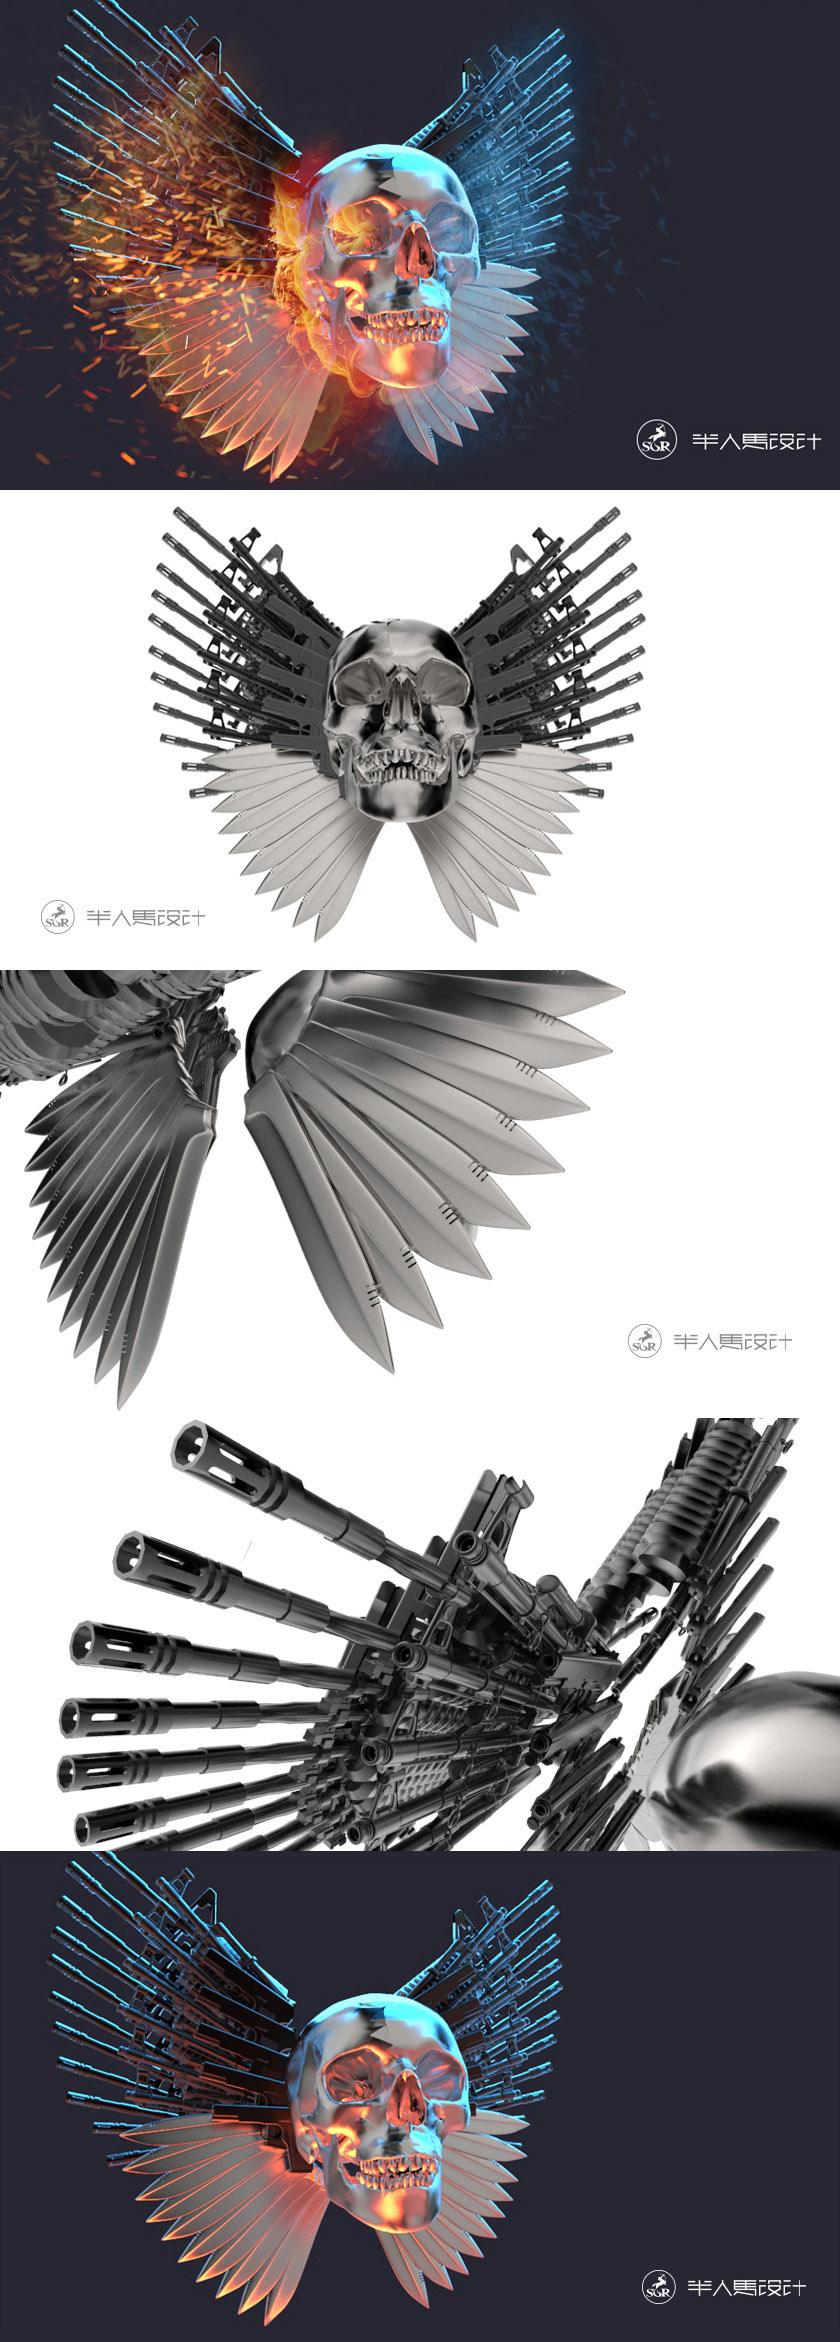 expendable 3D design